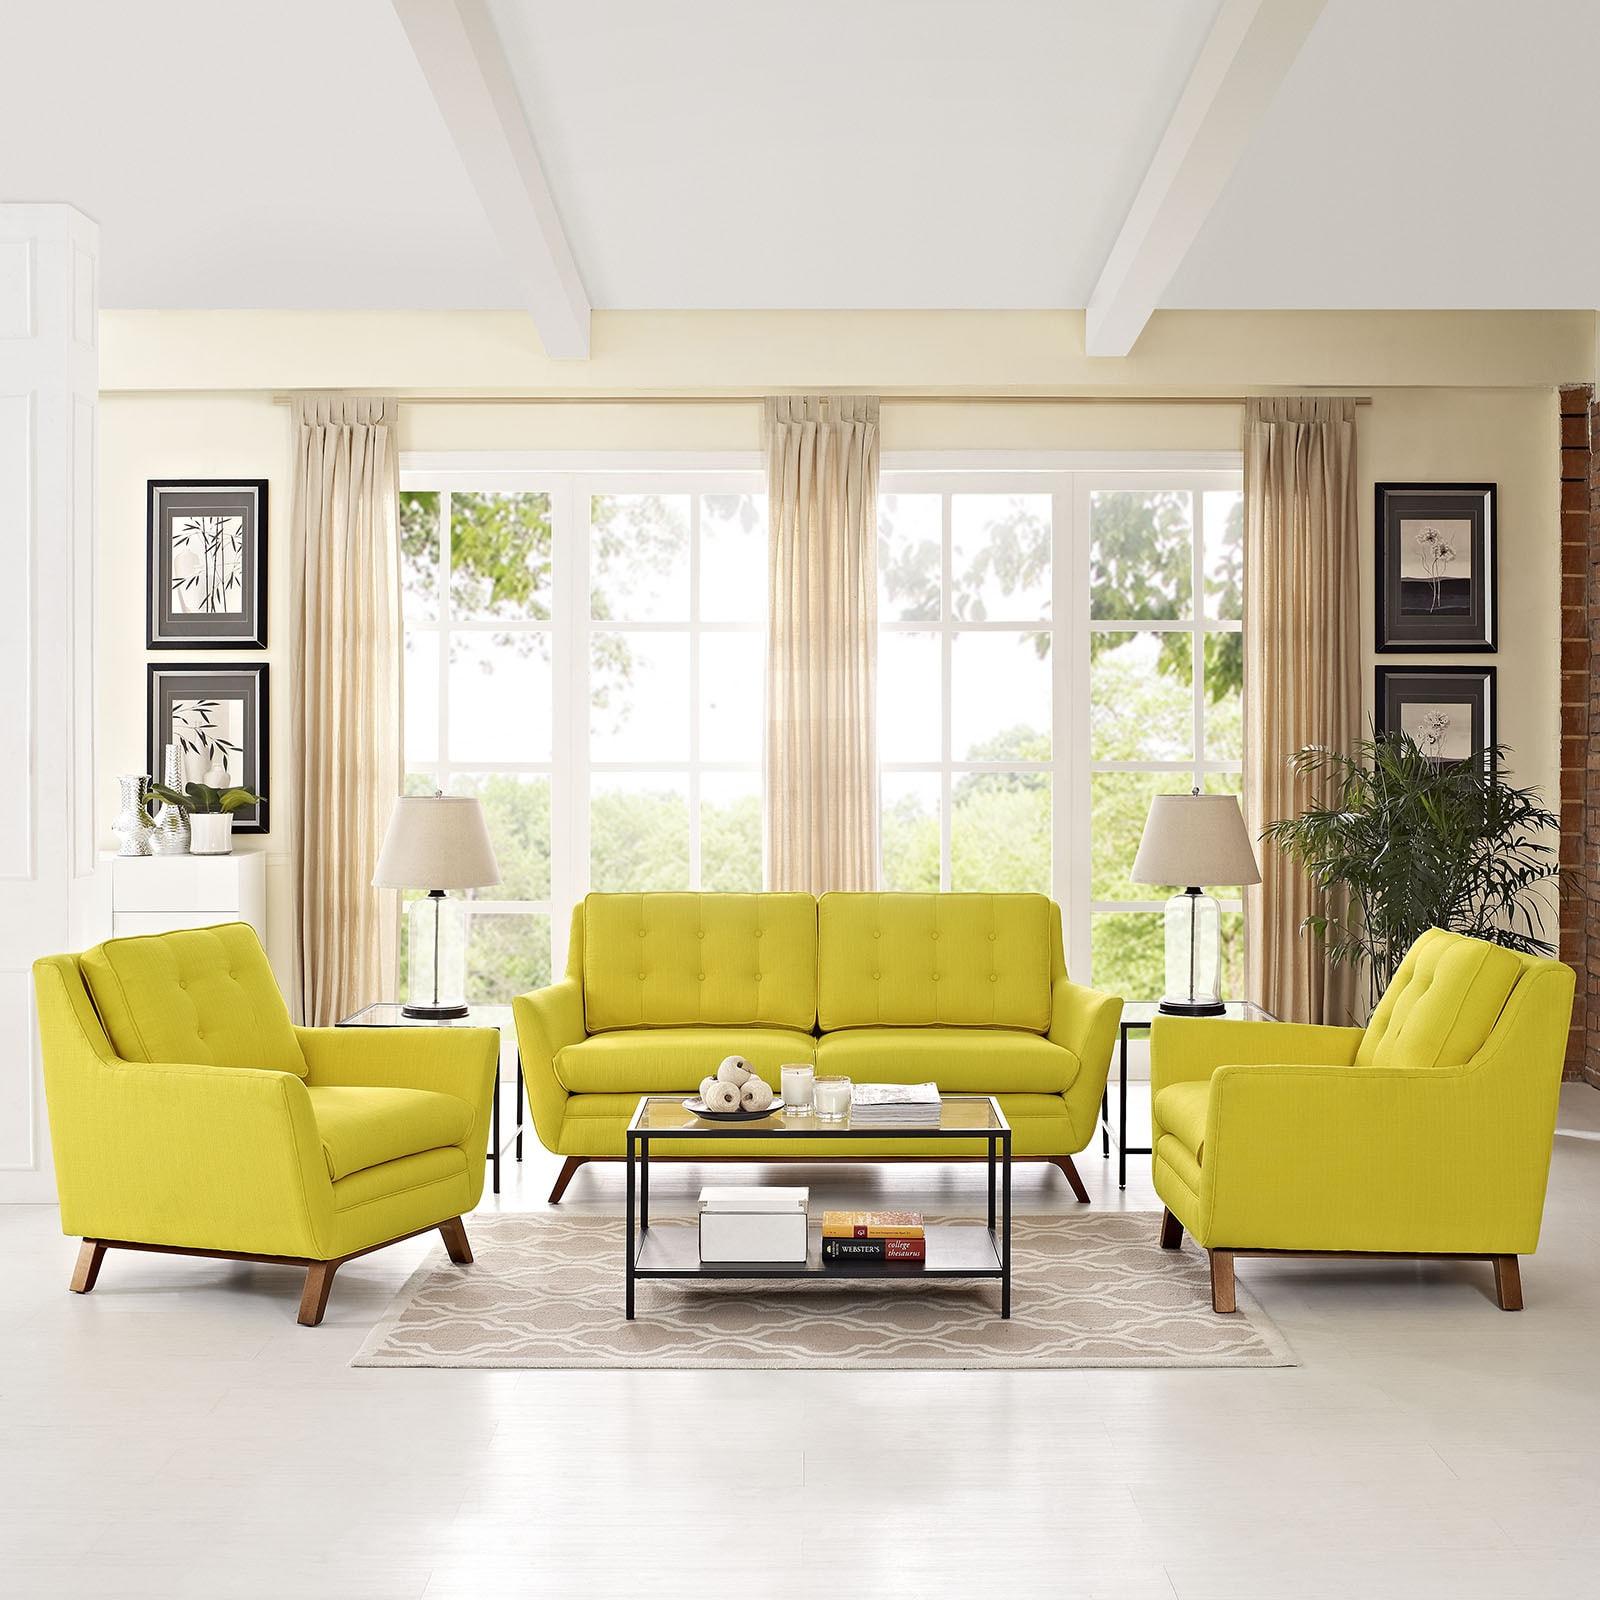 Shop Beguile Fabric 3 Piece Living Room Set